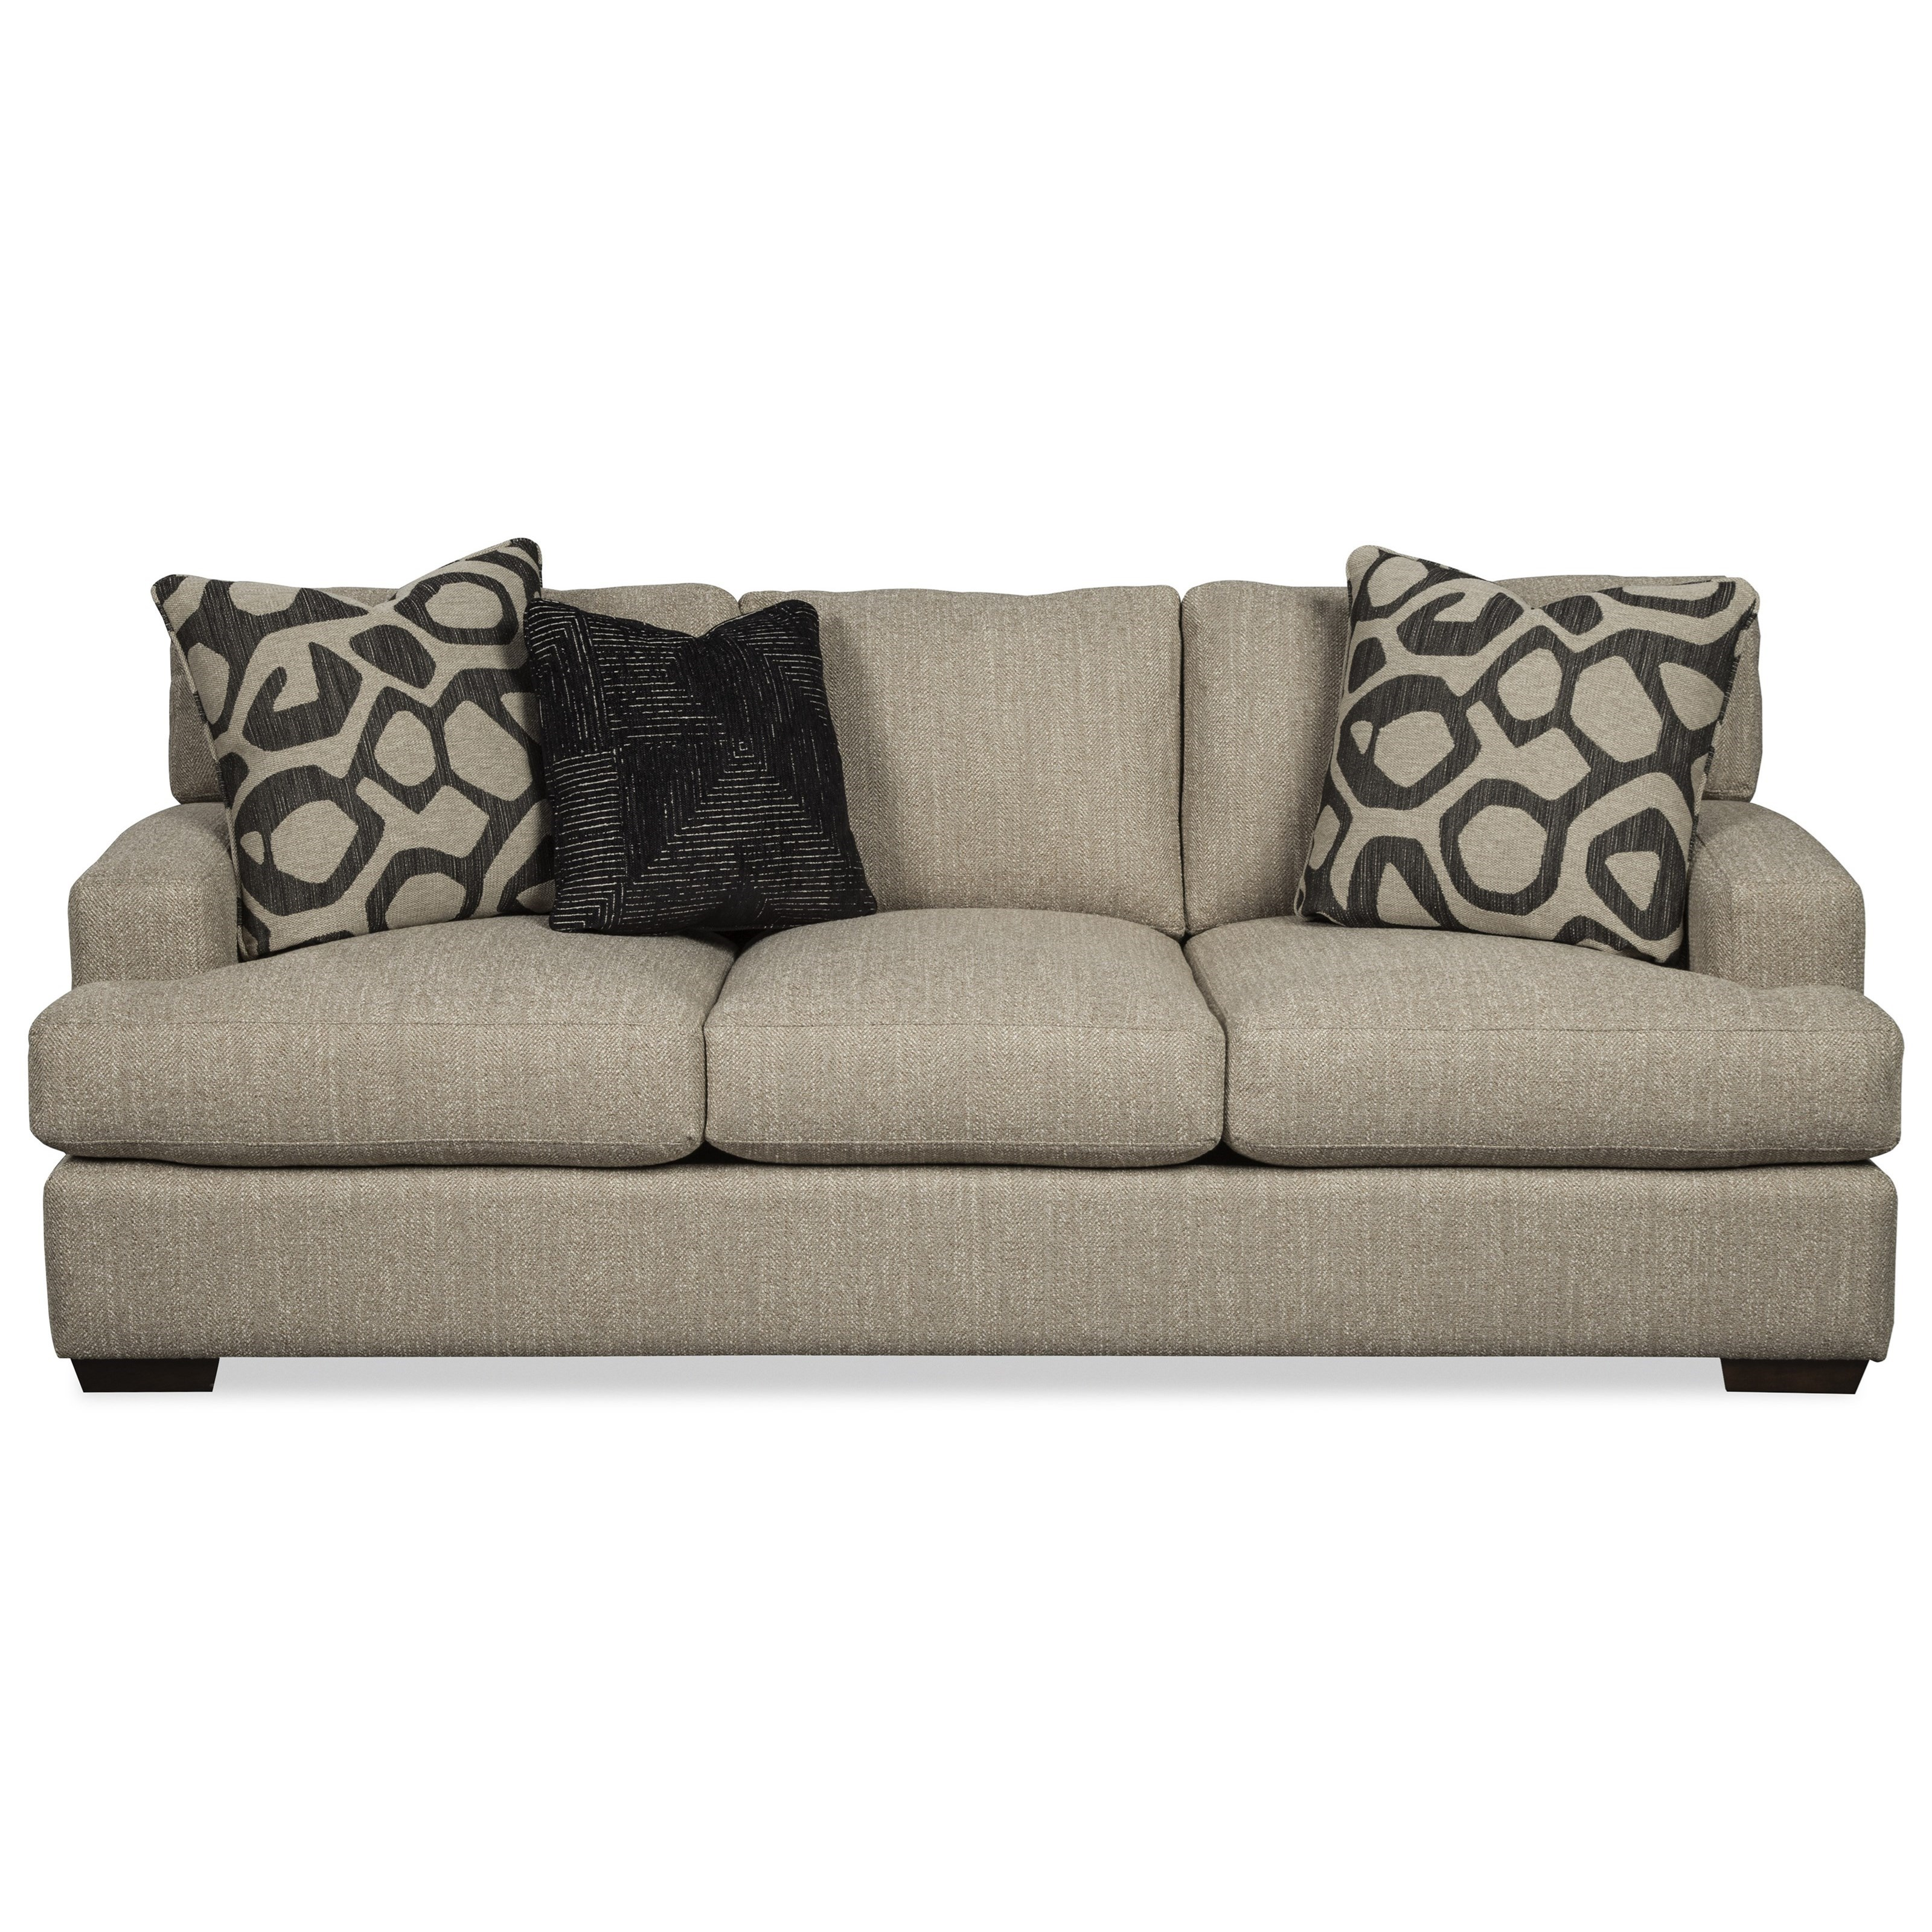 Fantastic Craftmaster 785350 785350Bd Contemporary Sofa With Wide Machost Co Dining Chair Design Ideas Machostcouk